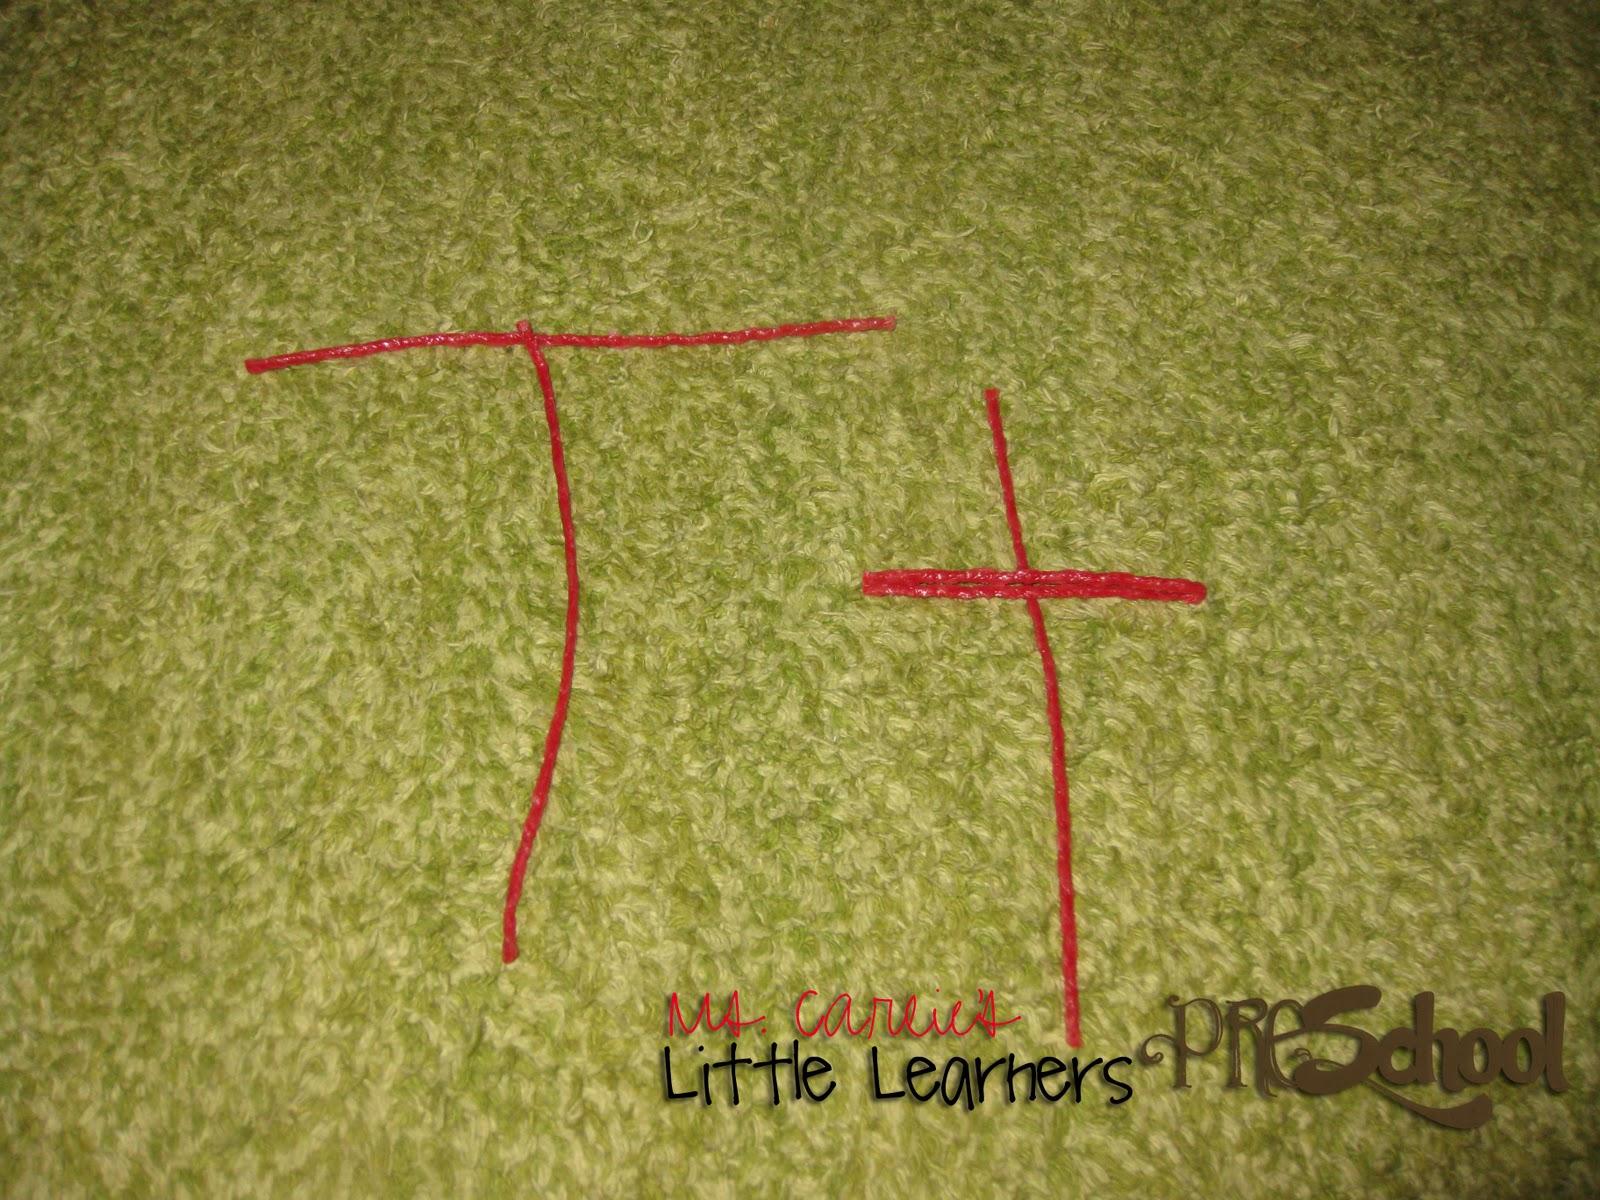 Ms Carlie S Little Learners Preschool February Week Three